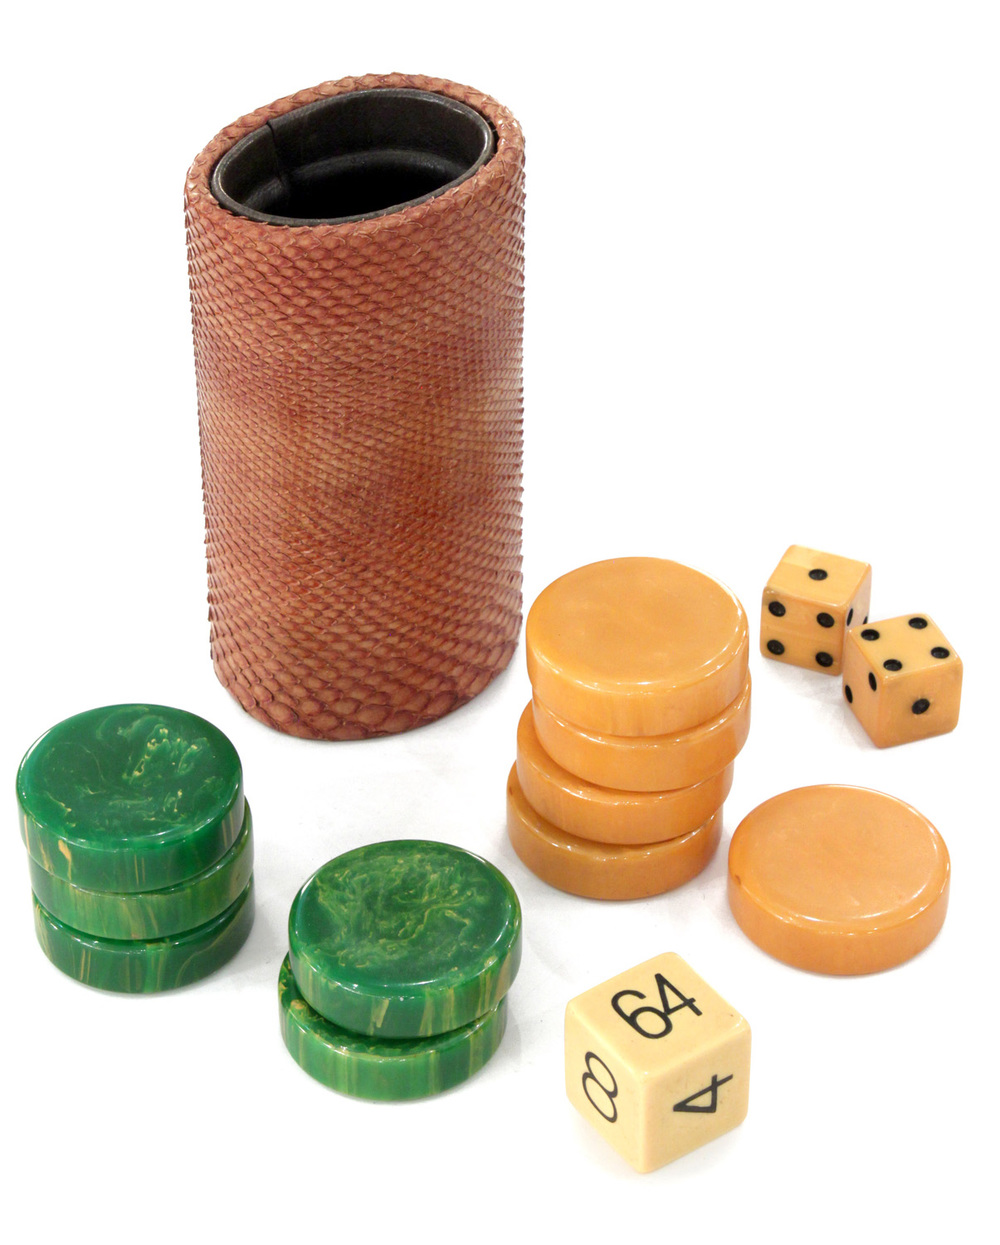 Springer 55 backgammon board gametable47 detail4 hires.jpg